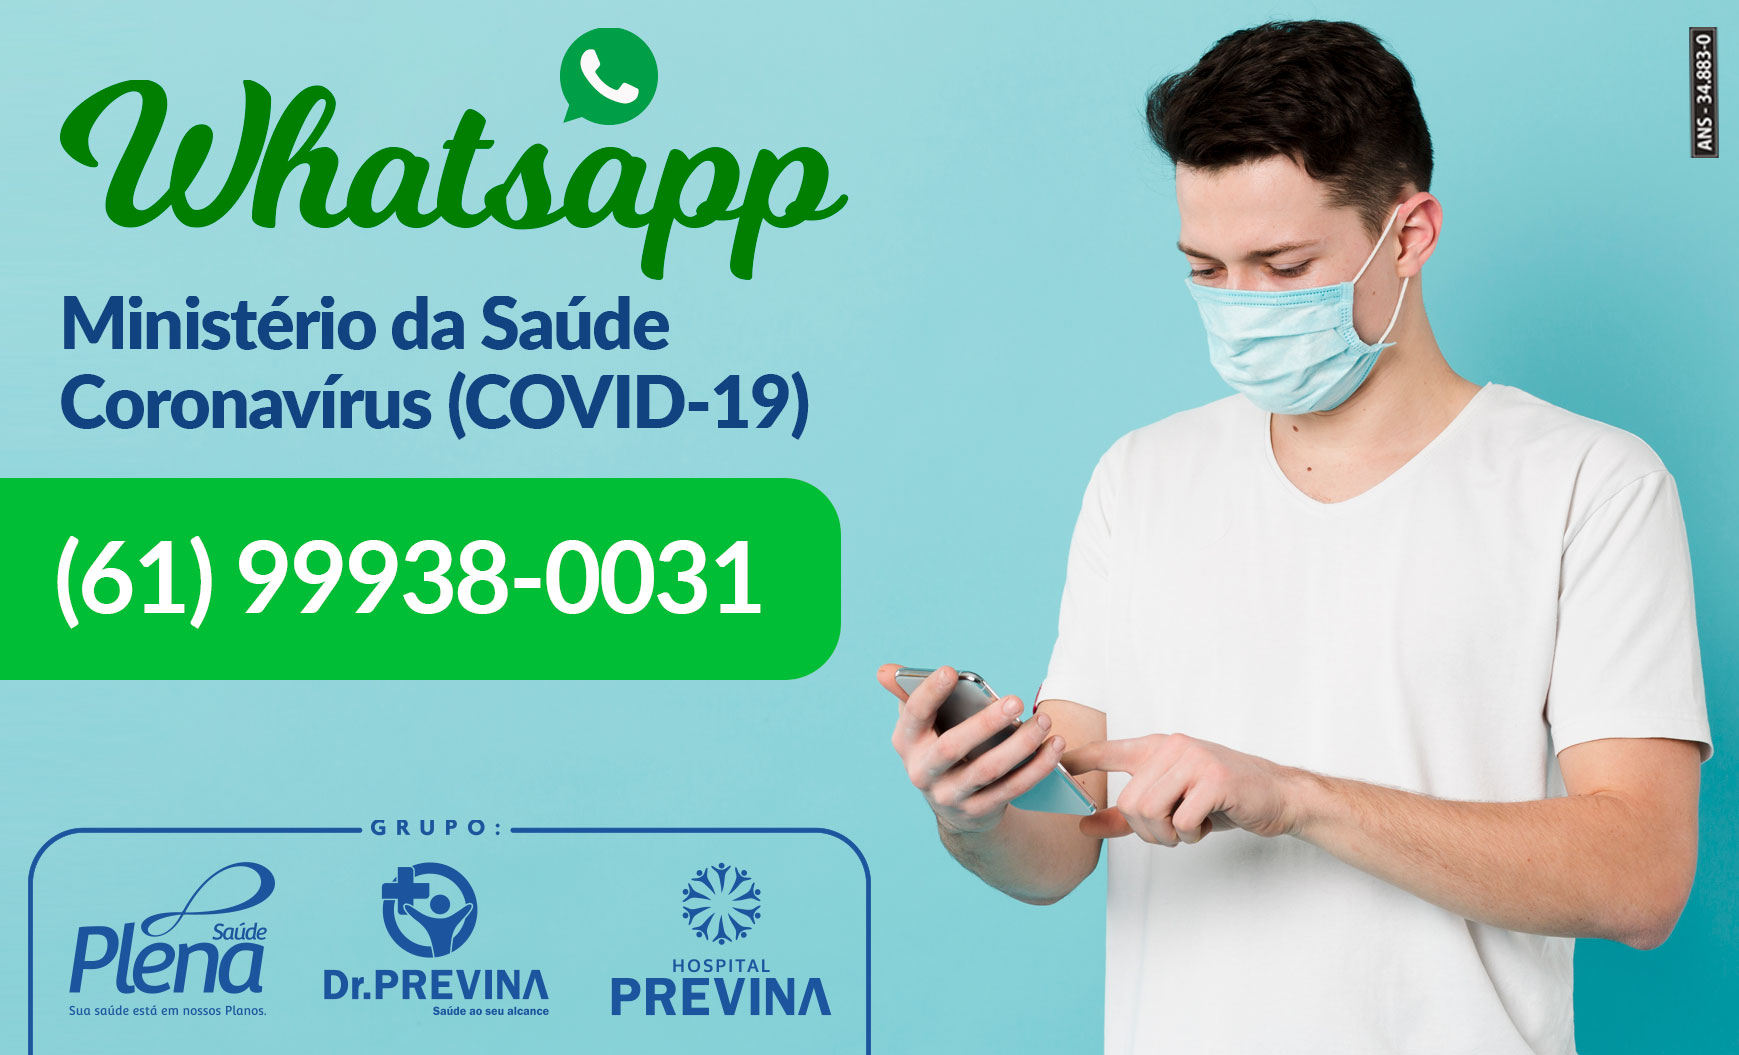 Whatsapp Ministério da Saúde – Coronavírus